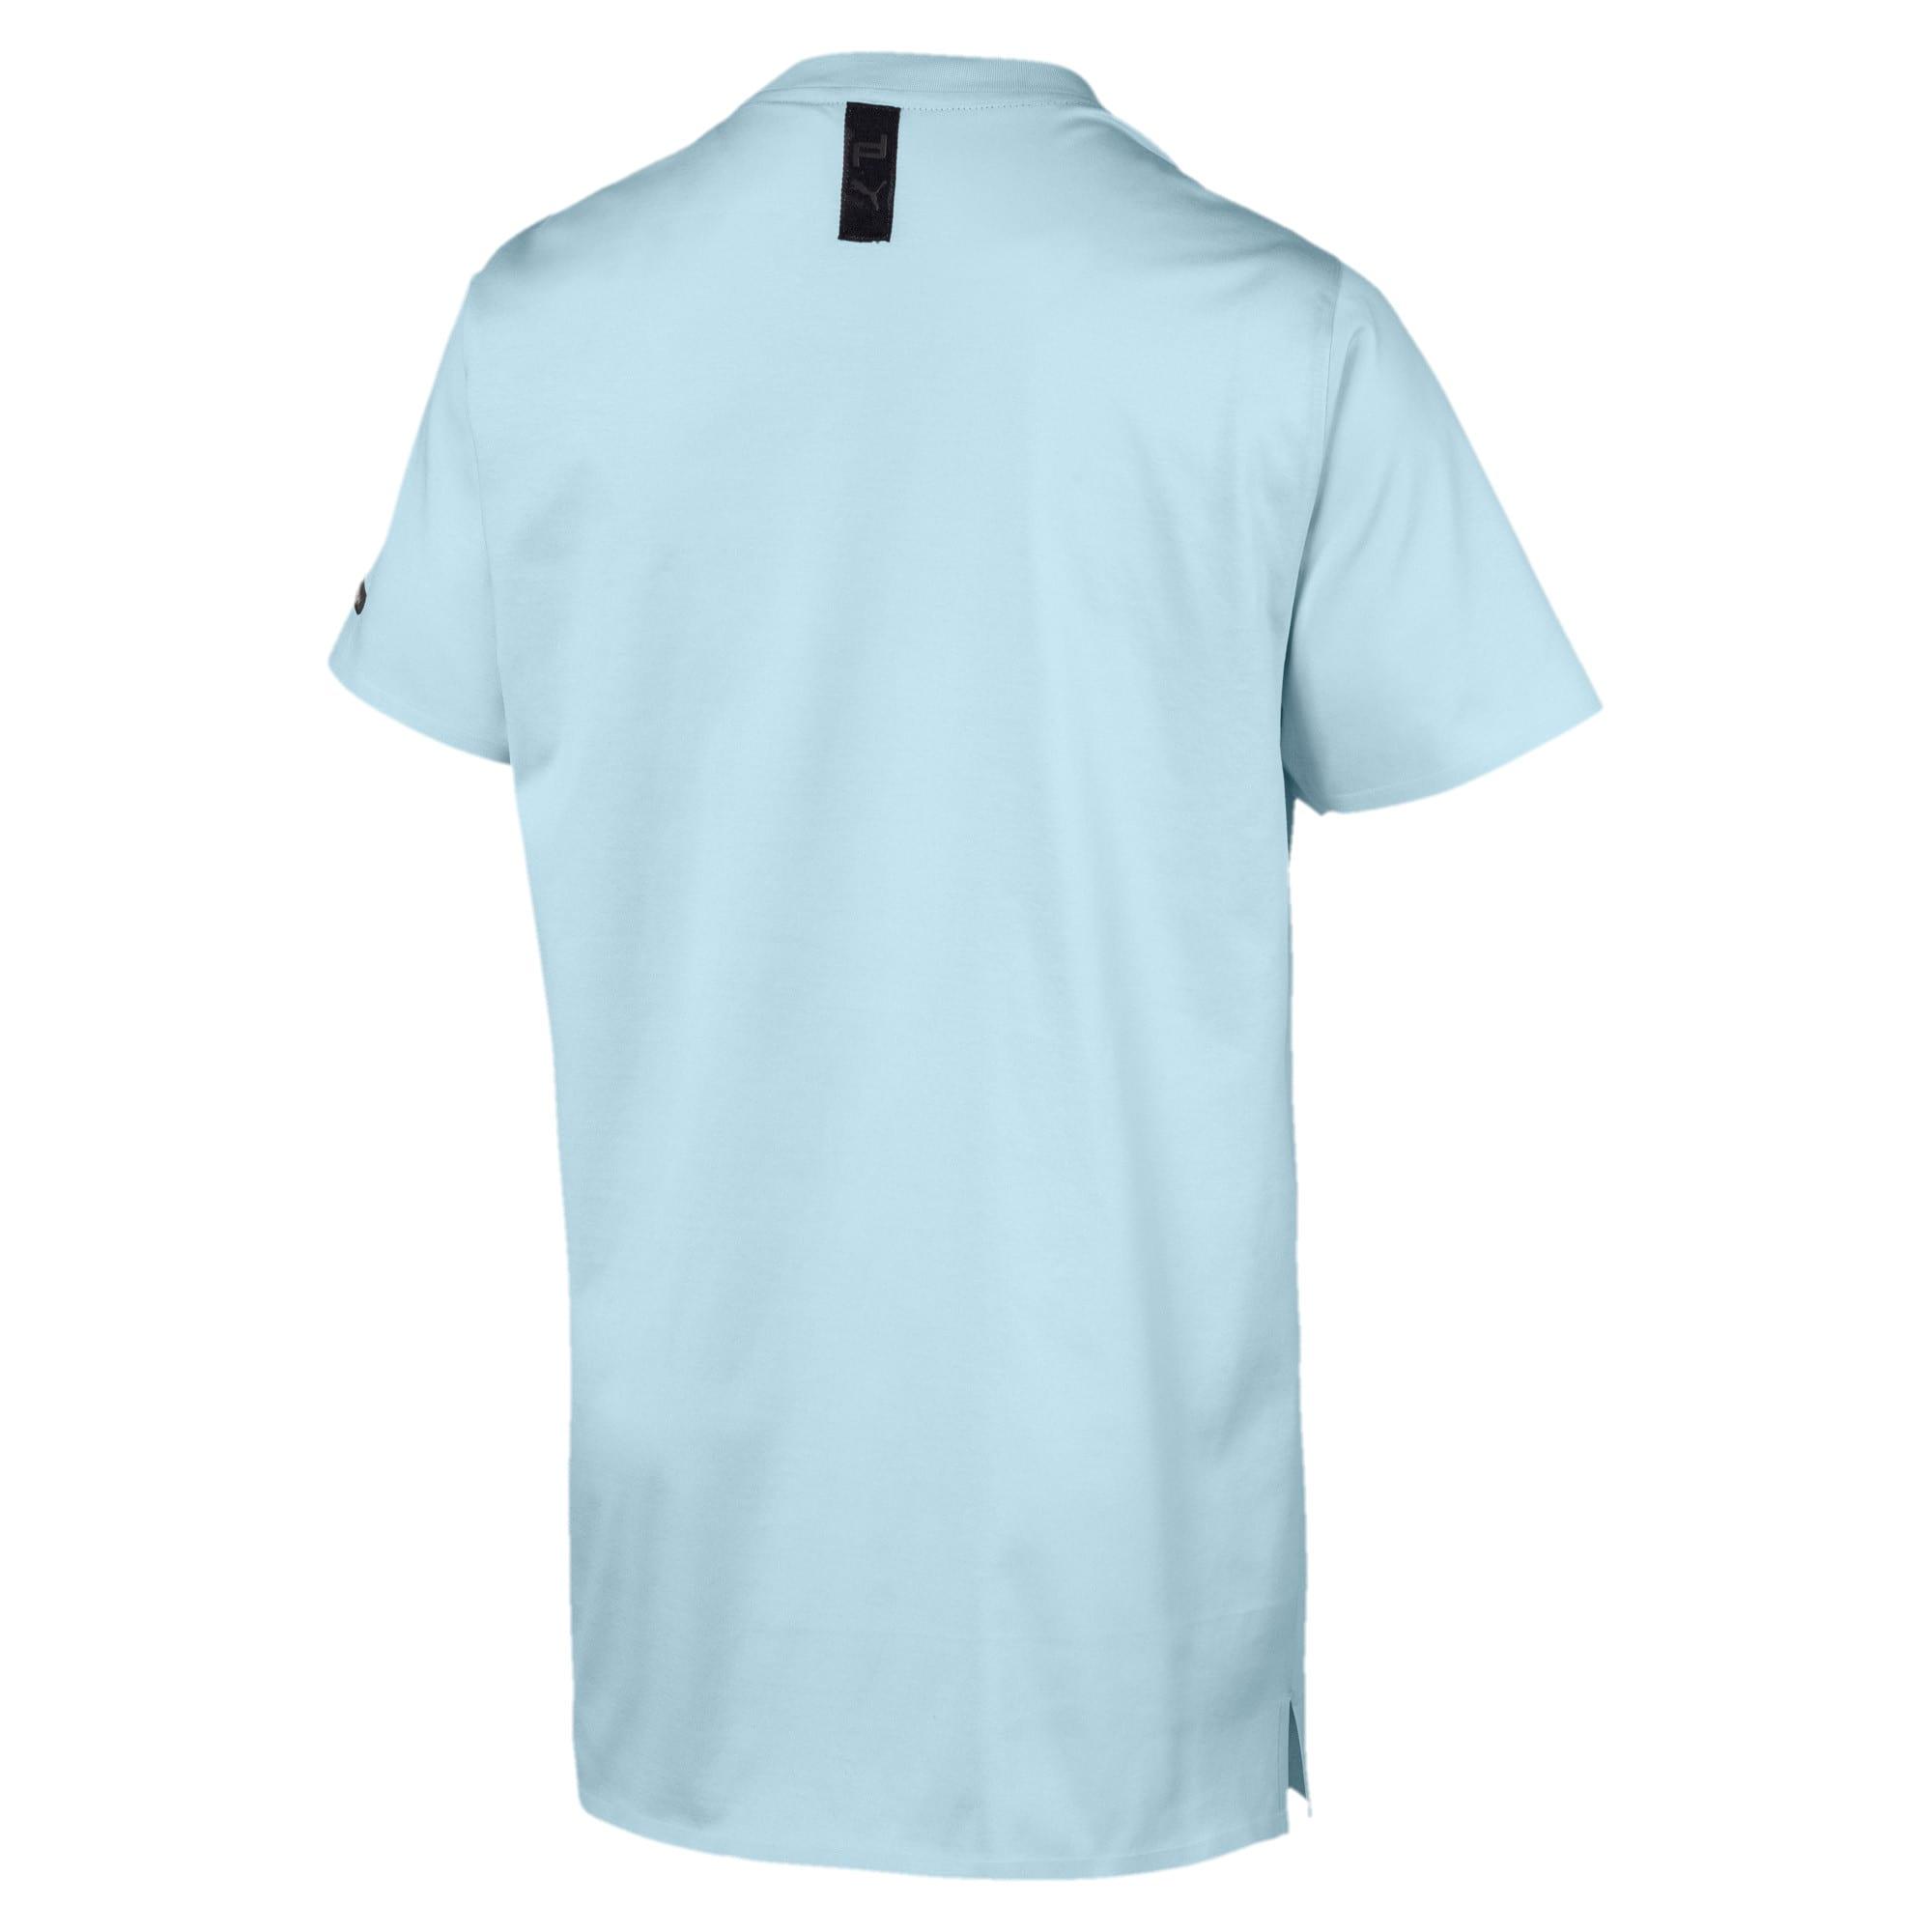 Thumbnail 3 of PORSCHE DESIGN  グラフィック Tシャツ, Light Sky, medium-JPN